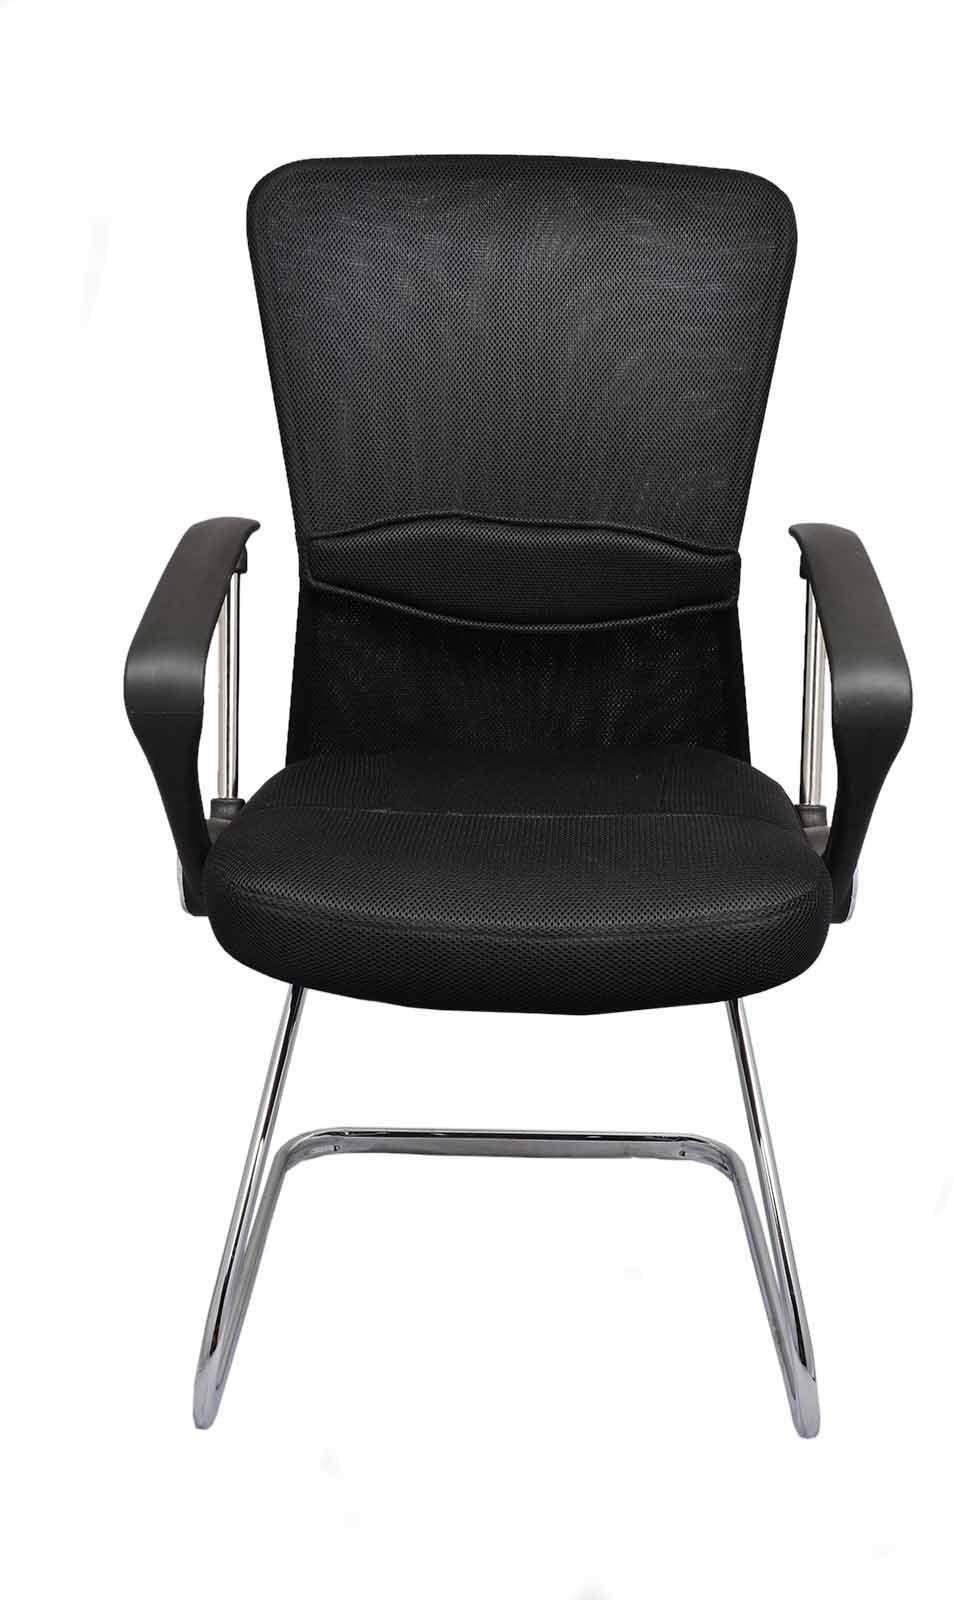 View Darla Interiors Fabric Office Chair(Black) Furniture (Darla Interiors)